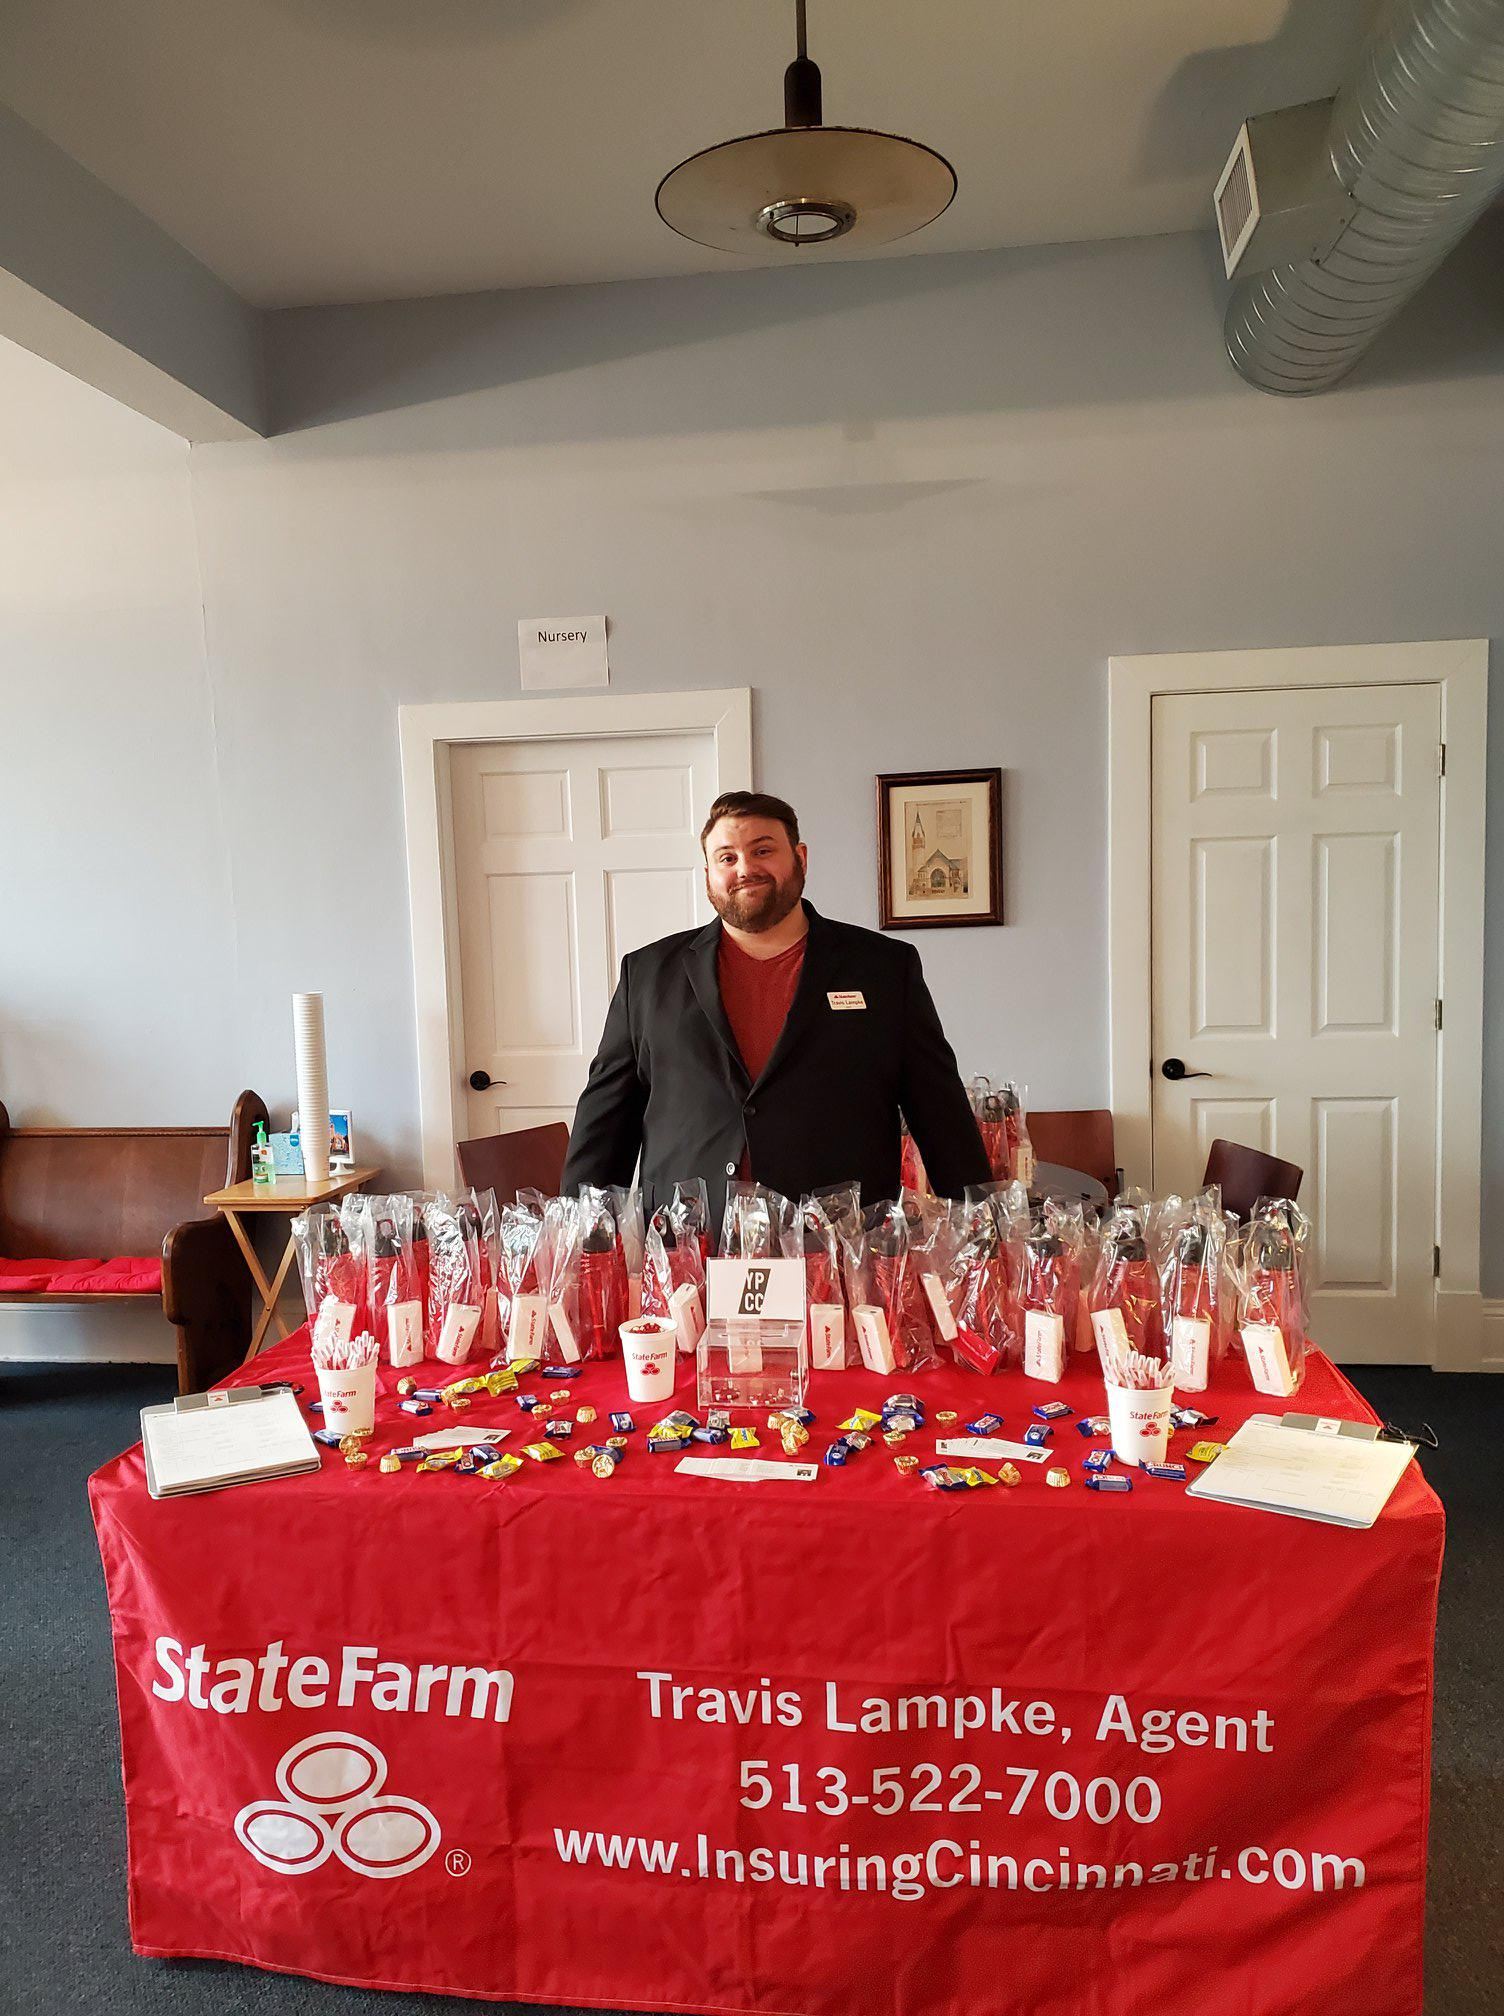 Travis Lampke - State Farm Insurance Agent